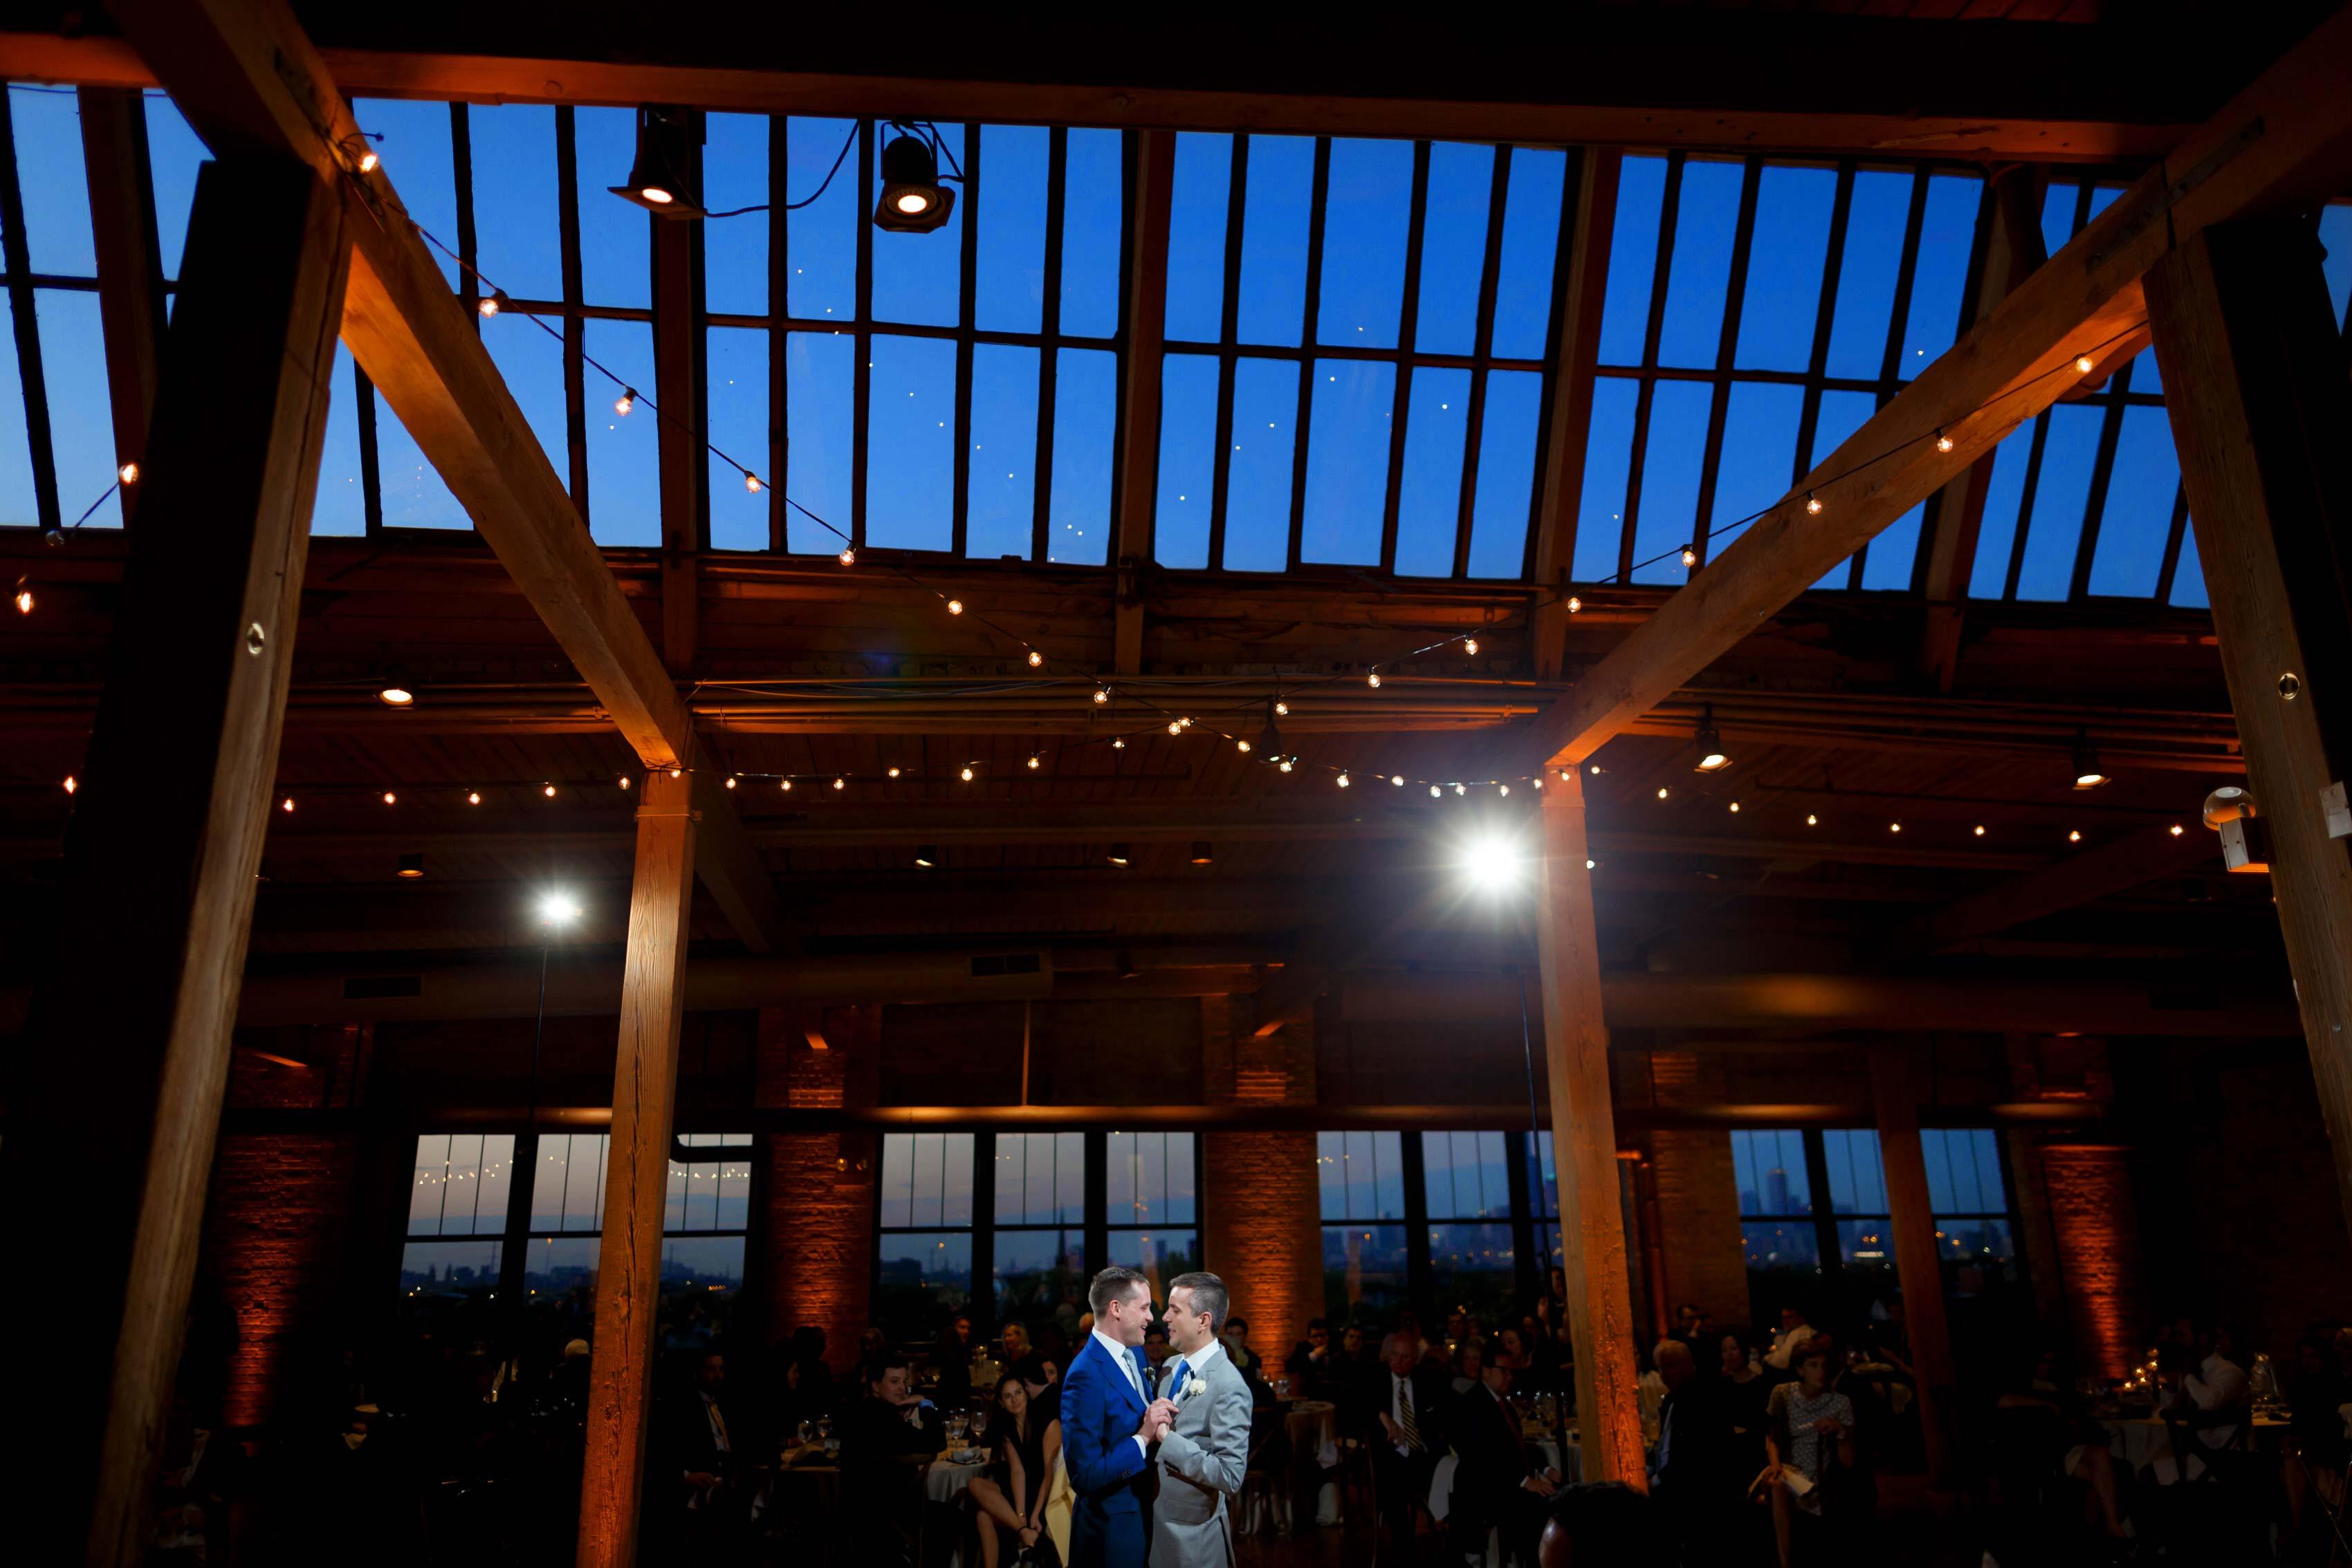 Skyline Loft Wedding at Bridgeport Art Center: David & Emmet